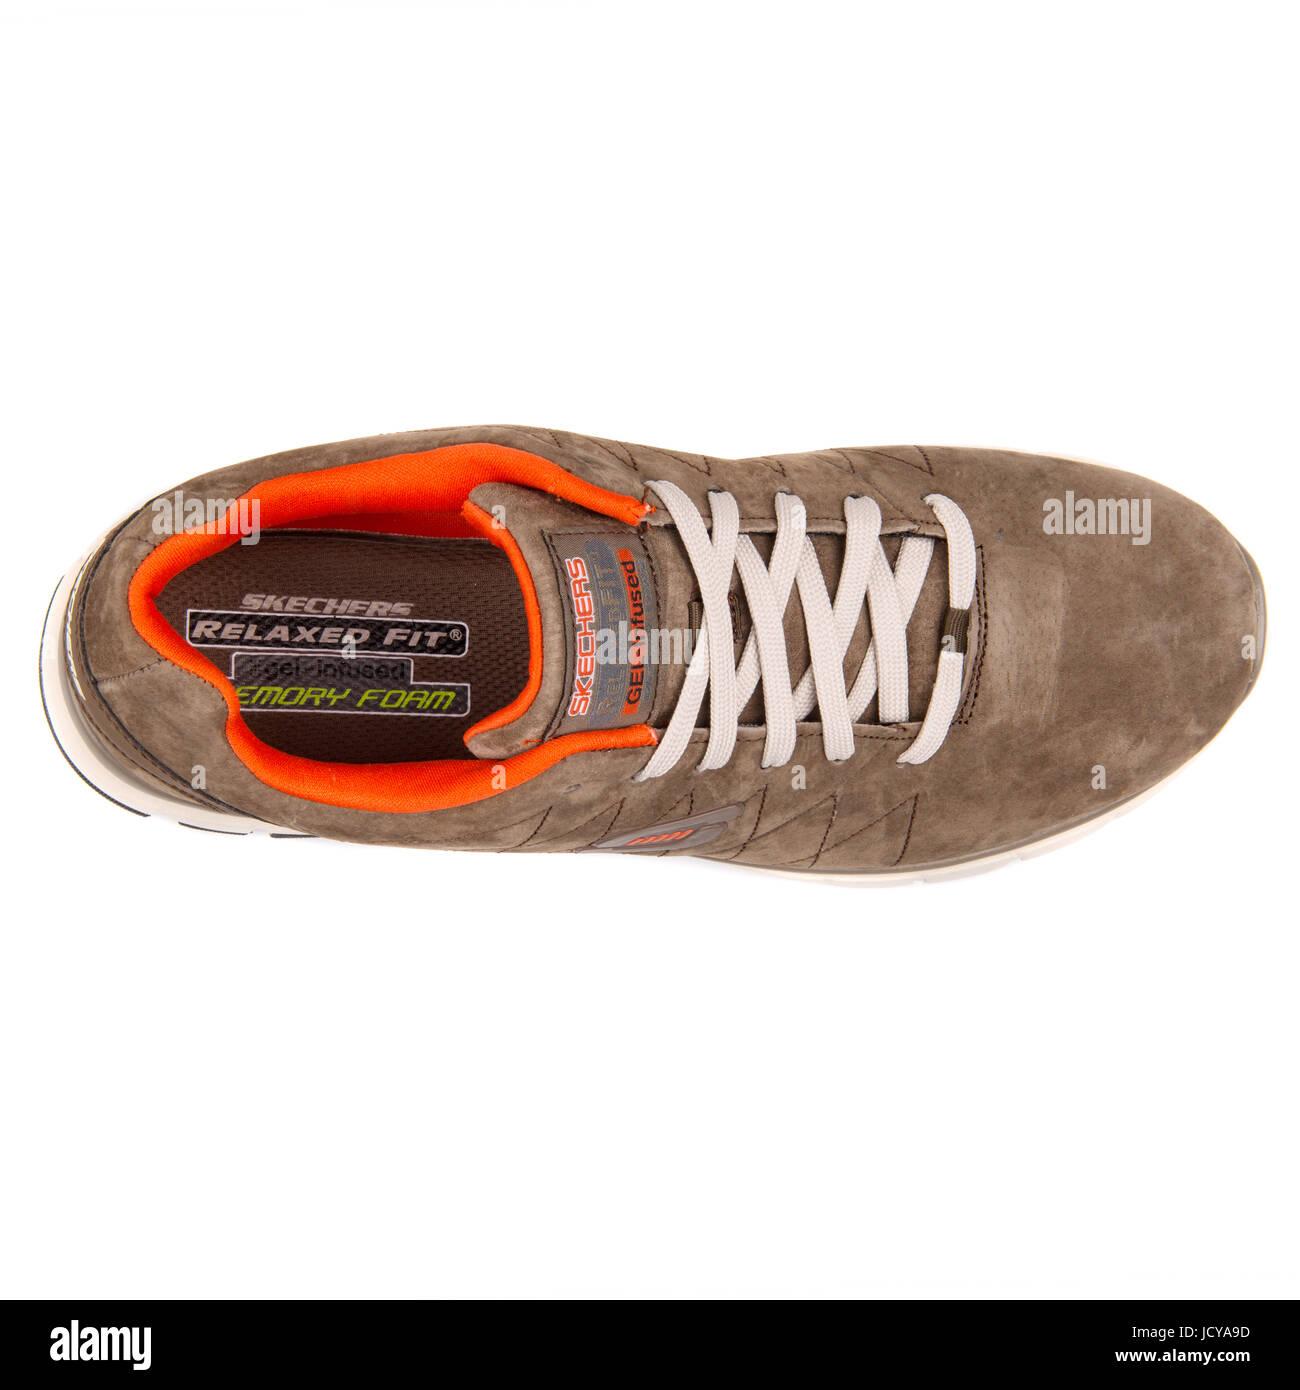 Skechers Skech Flex Natural Vigor Brown and Orange Men's